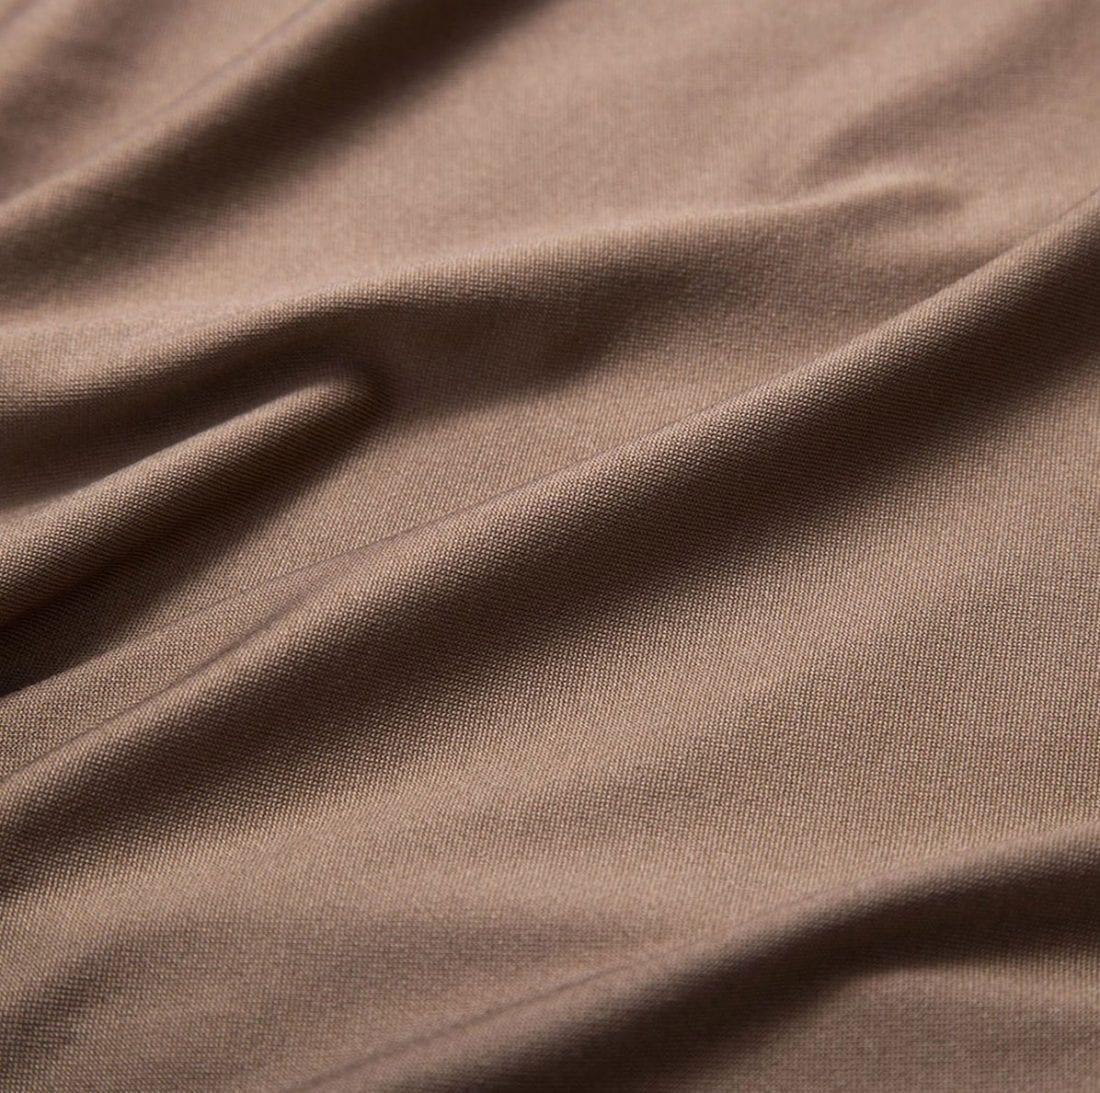 M0182 khaki8 Side Split Skirts maureens.com boutique